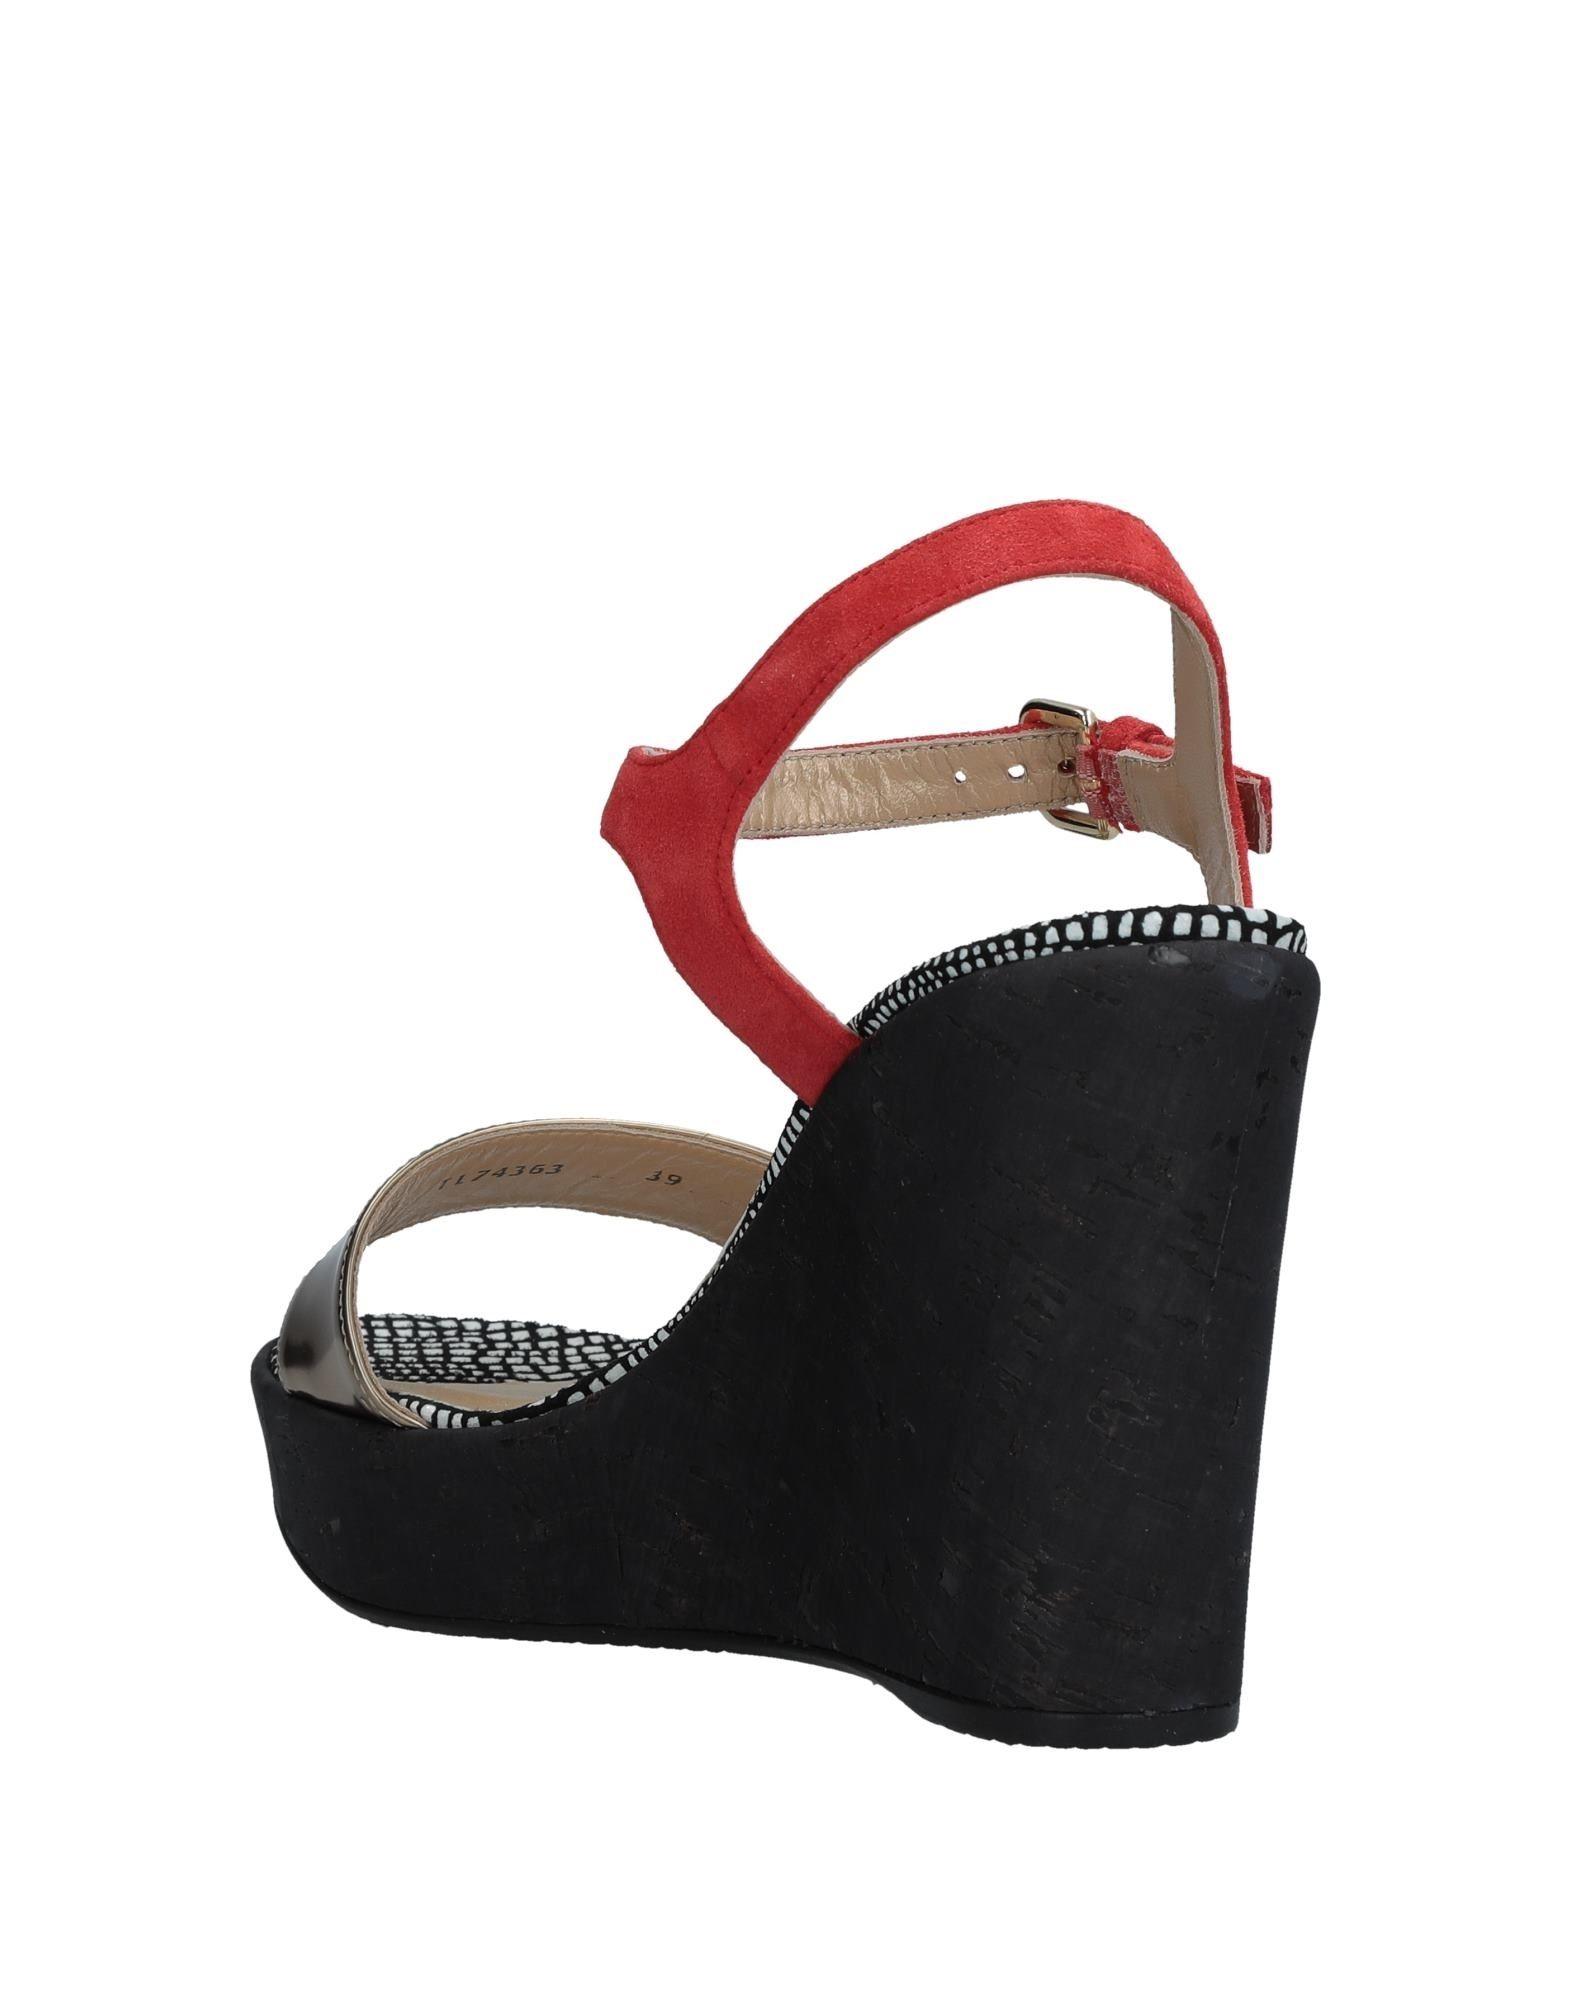 Stuart Damen Weitzman Sandalen Damen Stuart  11541978NE Beliebte Schuhe d2a962